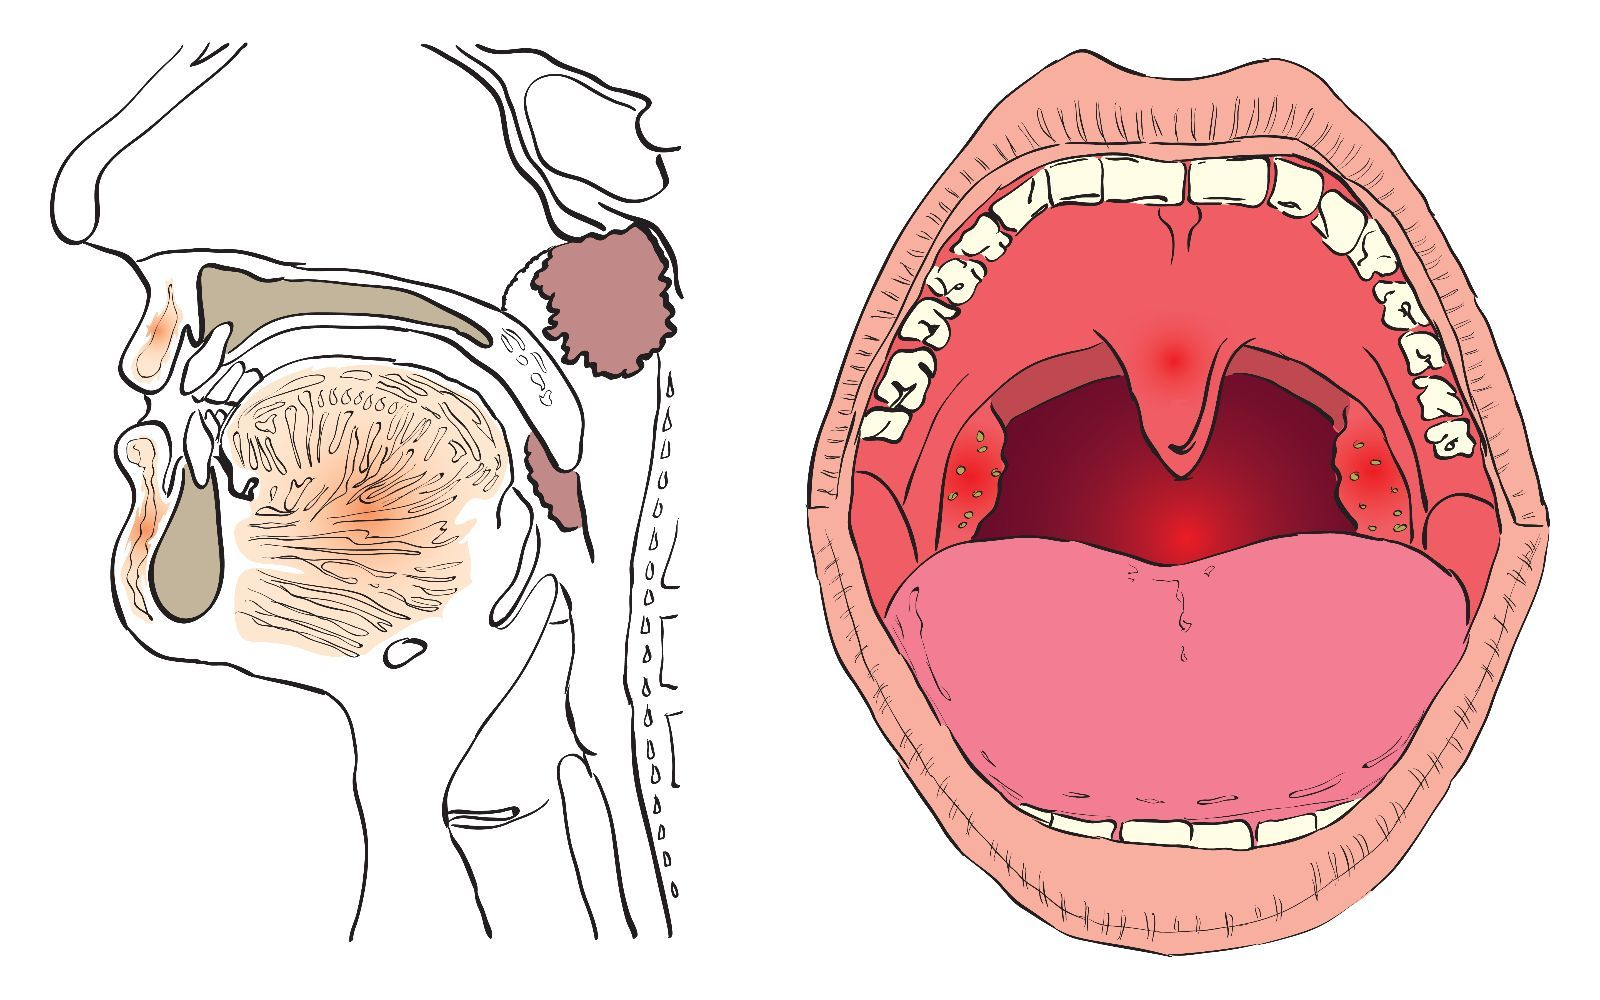 Cuándo quitar amígdalas y/o adenoides - http://plenilunia.com ...